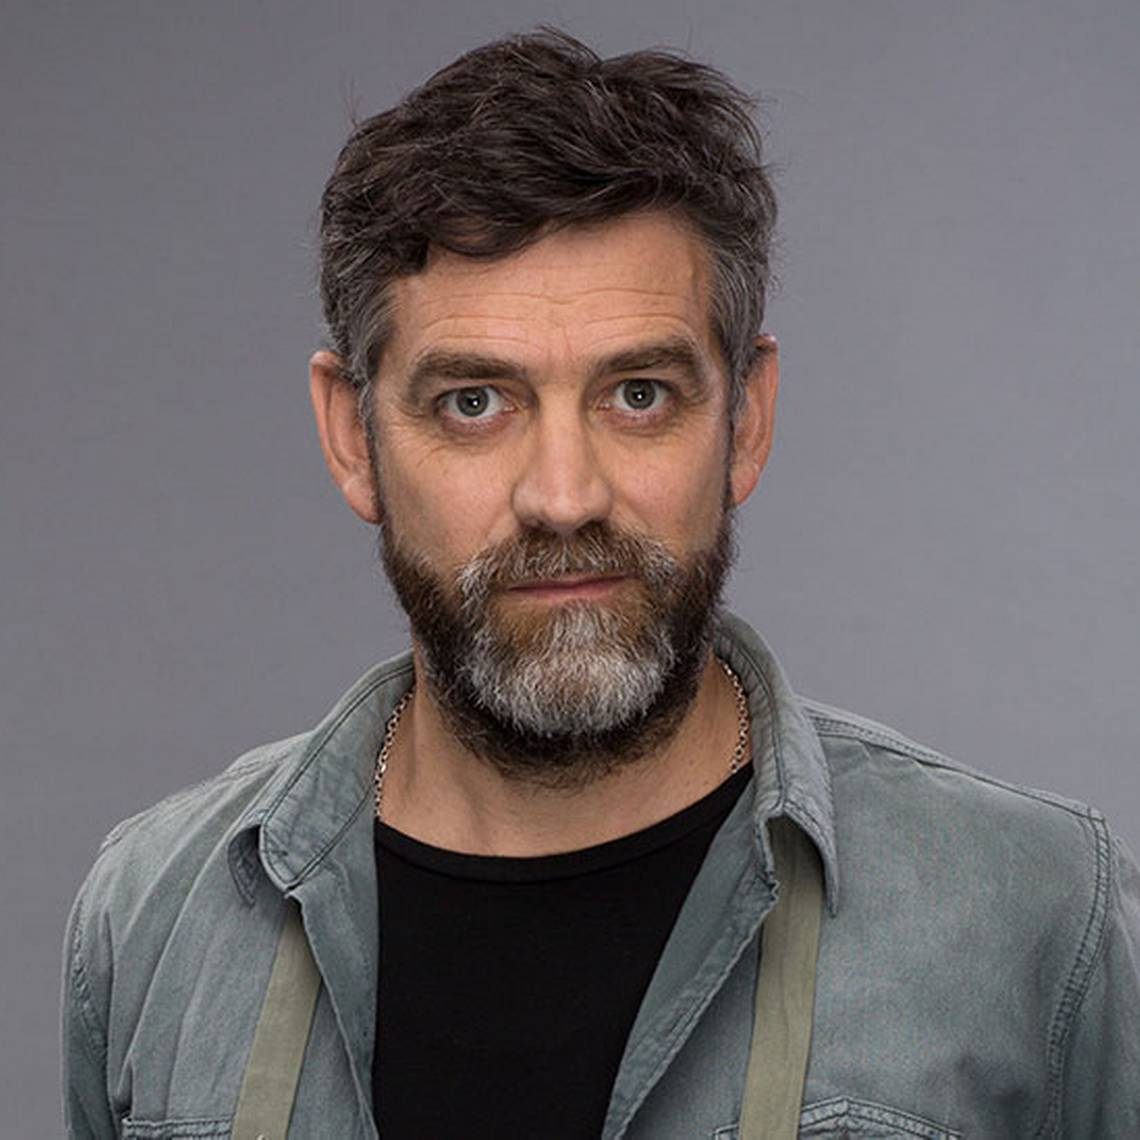 Pedro Watson